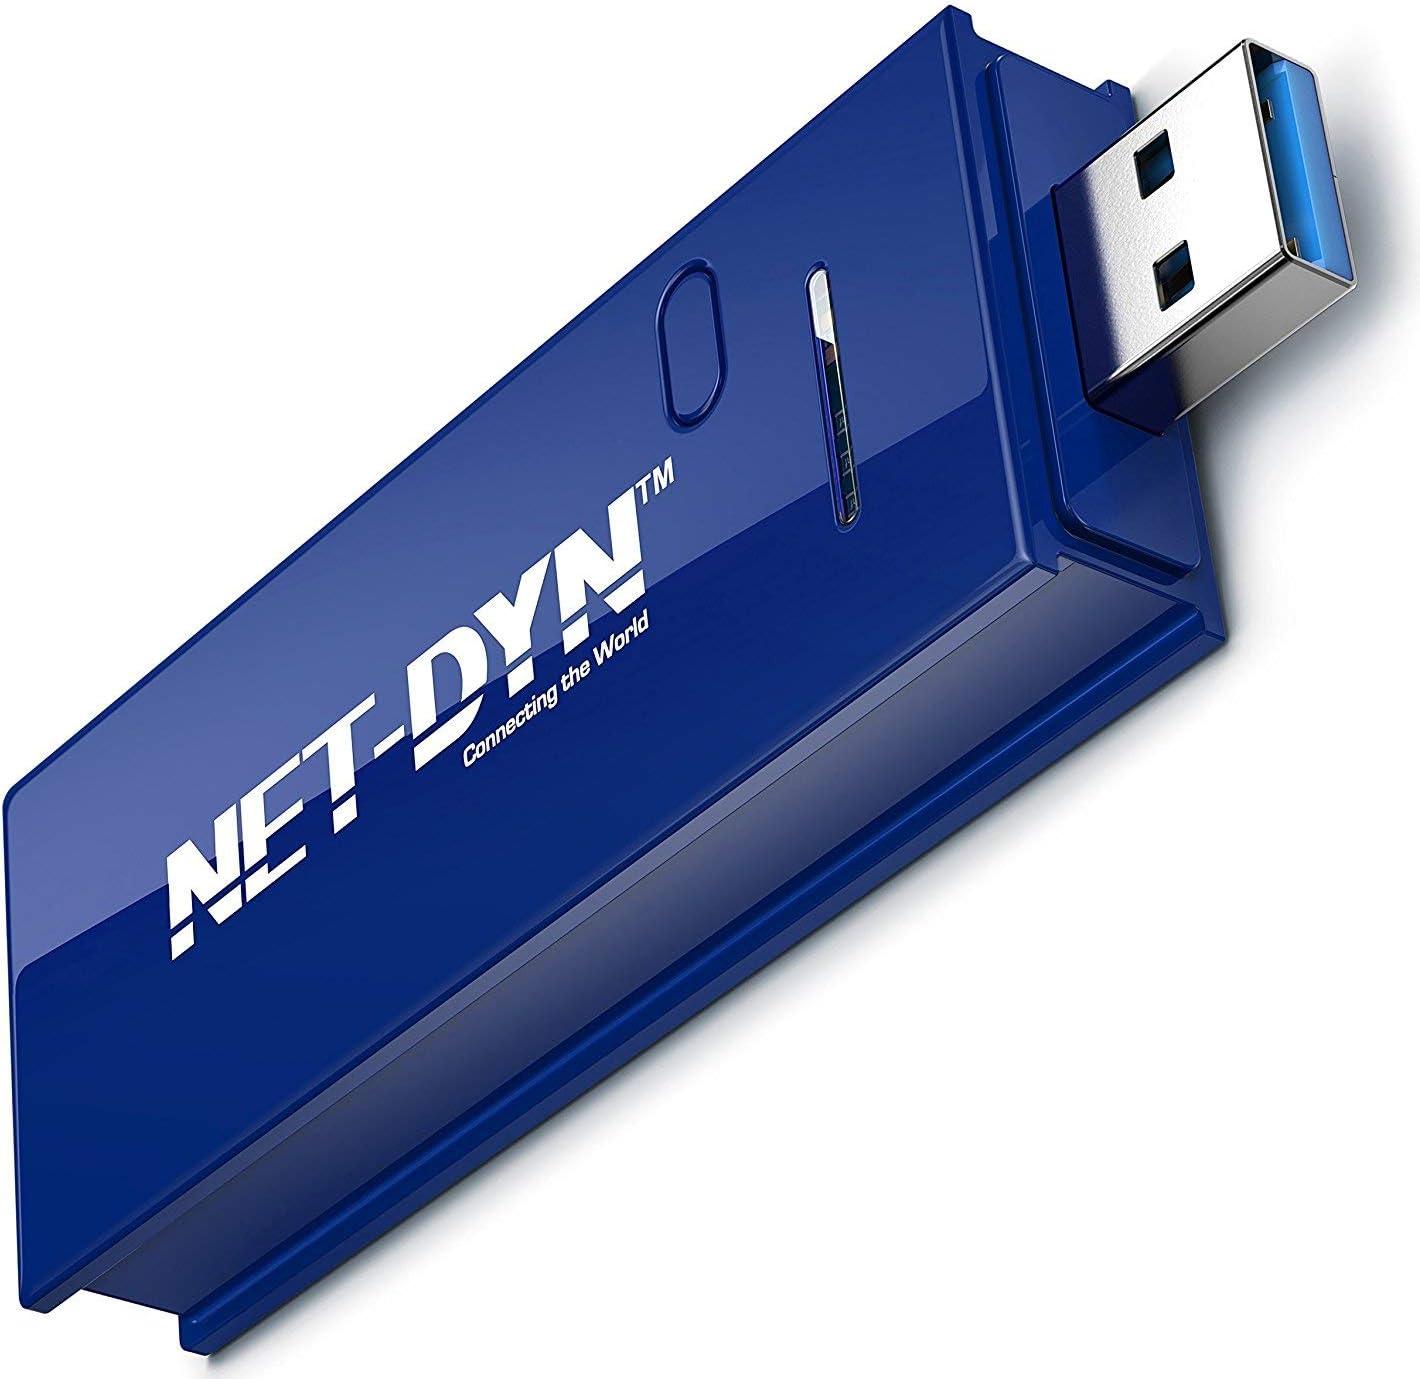 Buy NET DYN USB Wireless WiFi Adapter,AC20 Dual Band, 20GHz and ...